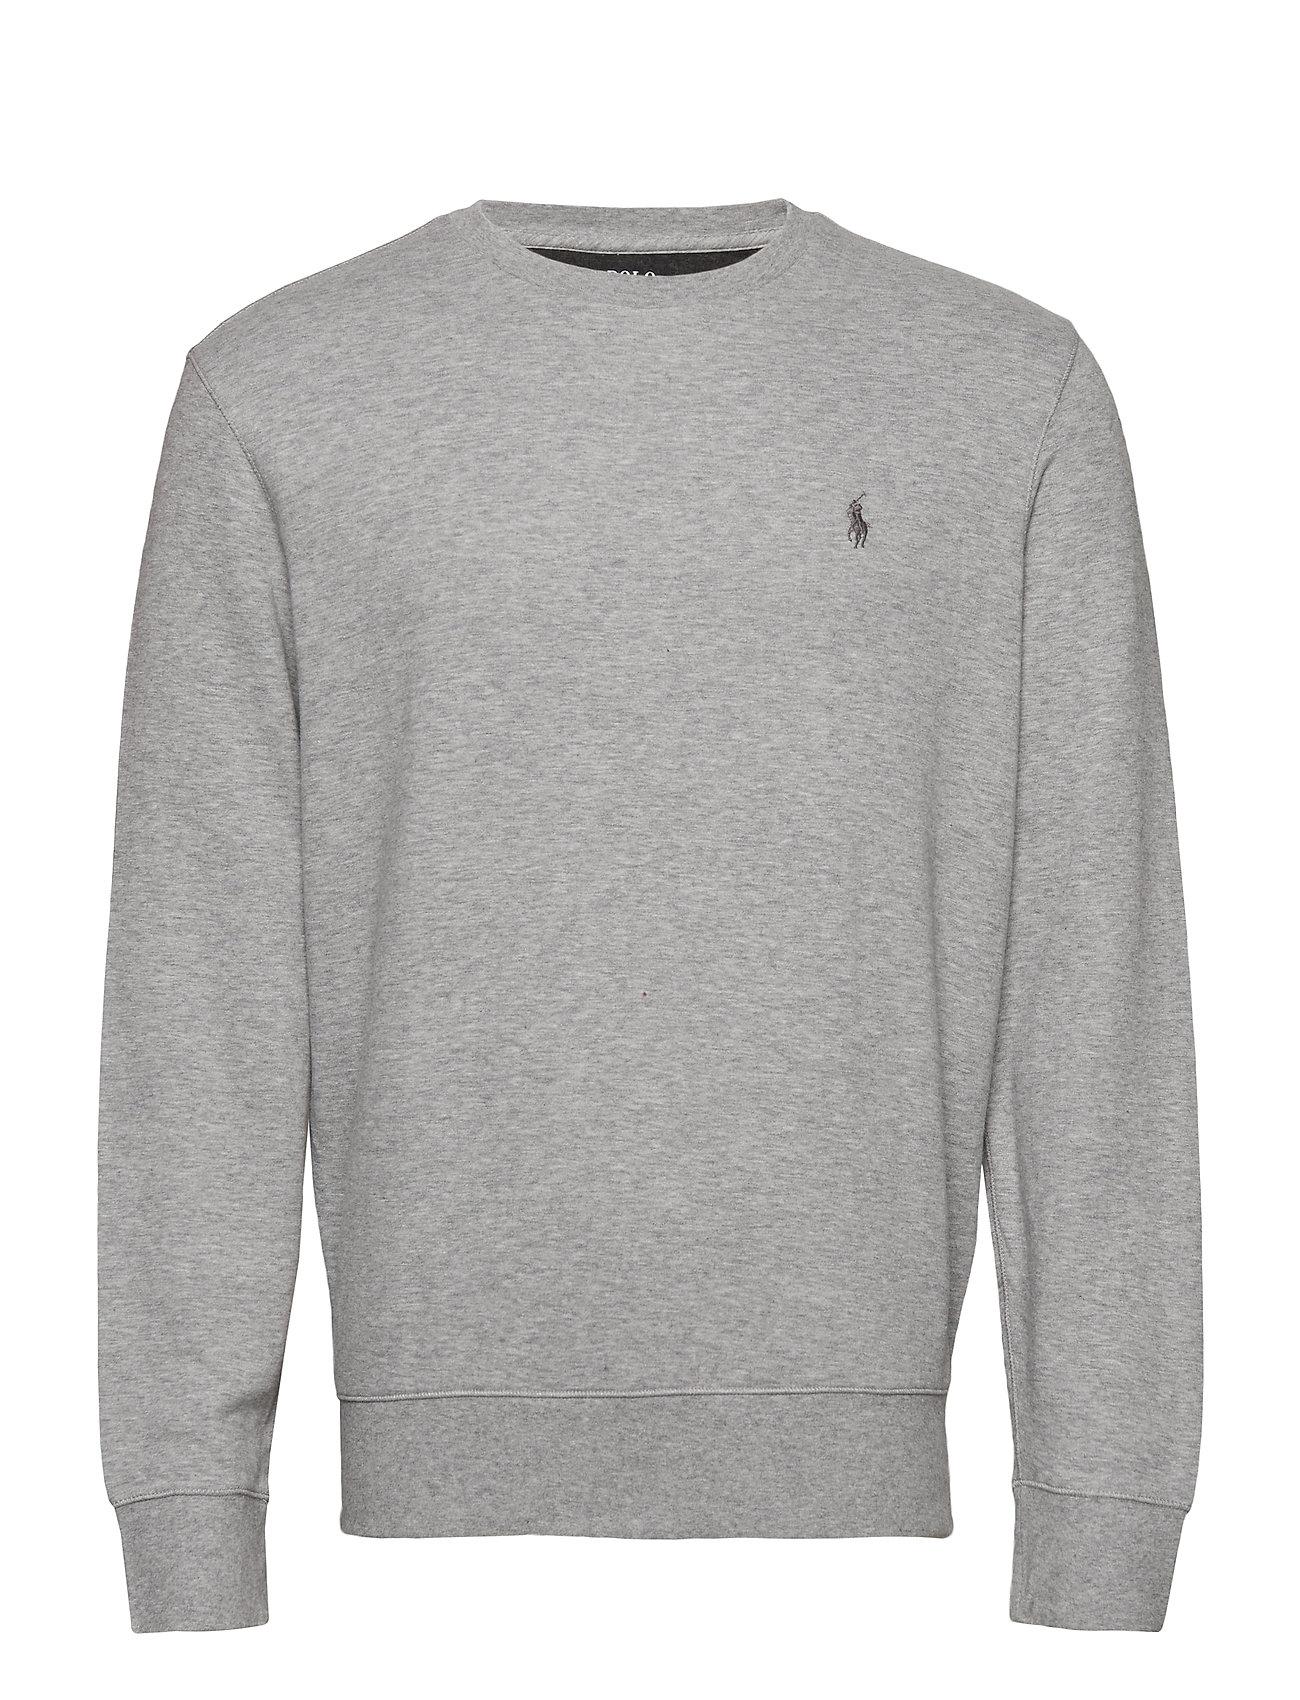 Polo Ralph Lauren Double Knit Sweatshirt